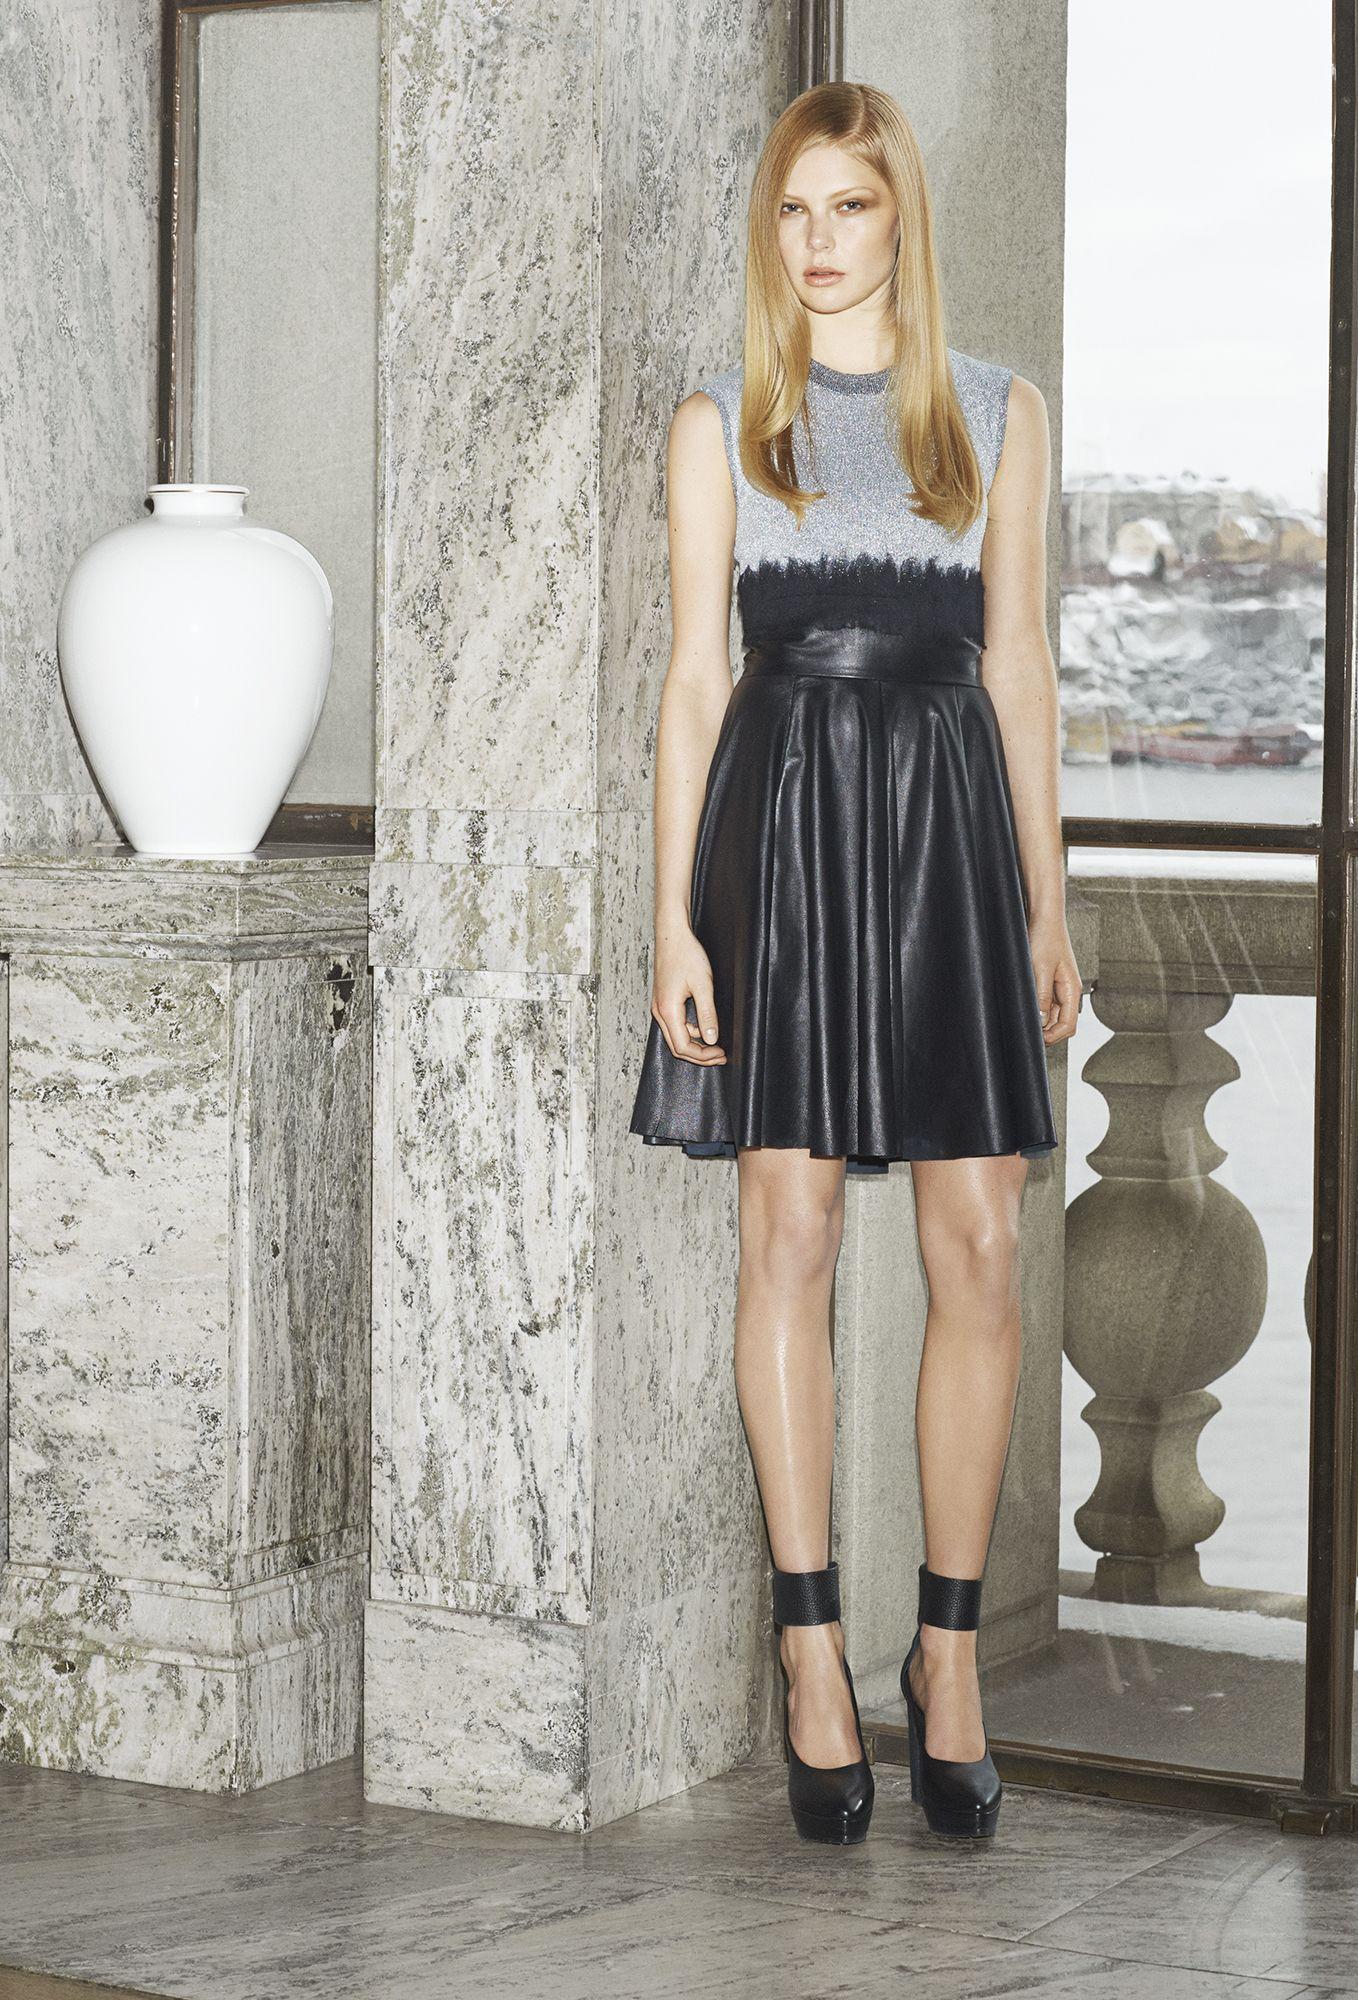 Fall/Winter 2014   House of Dagmar #Top Black Monochrome Leather Skirt Casual Modern Love Style Fashion